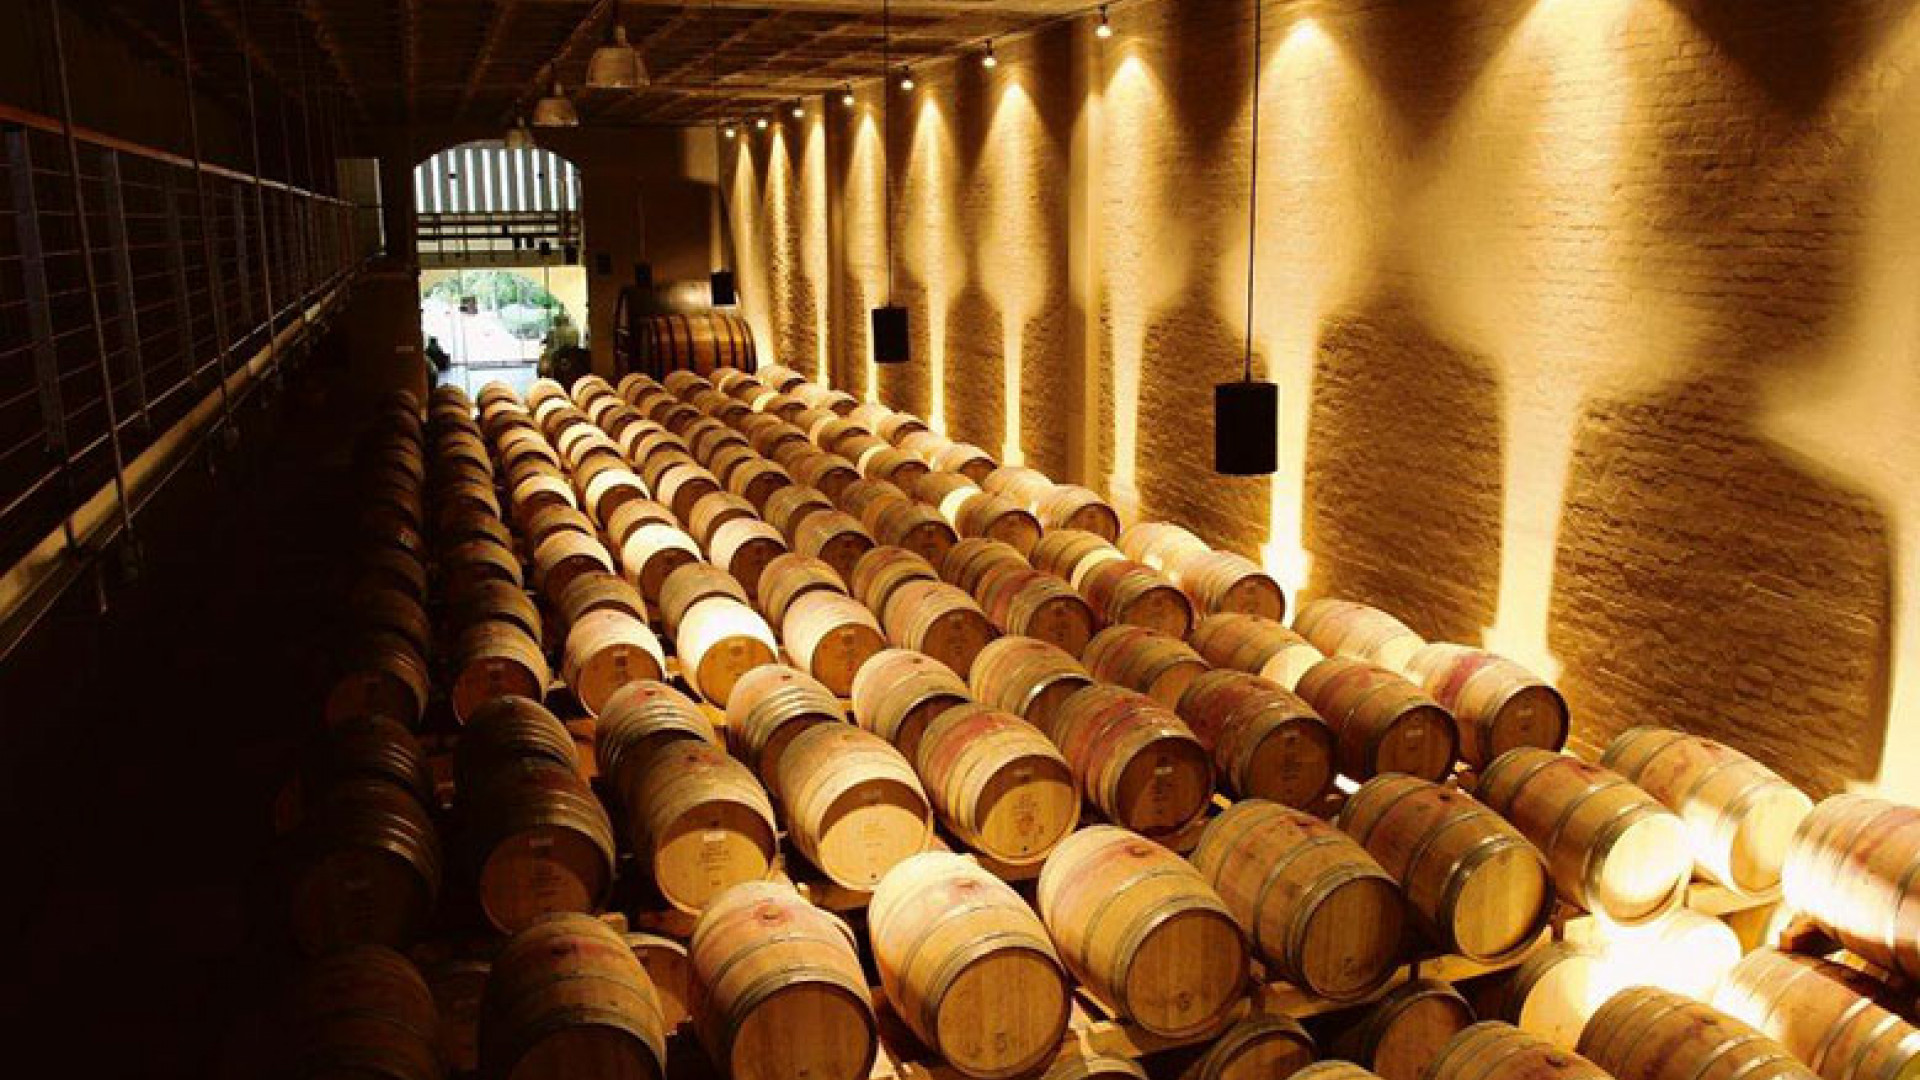 Groot-Constantia-barrels.-Image-credit-Cape-Town-Tourism